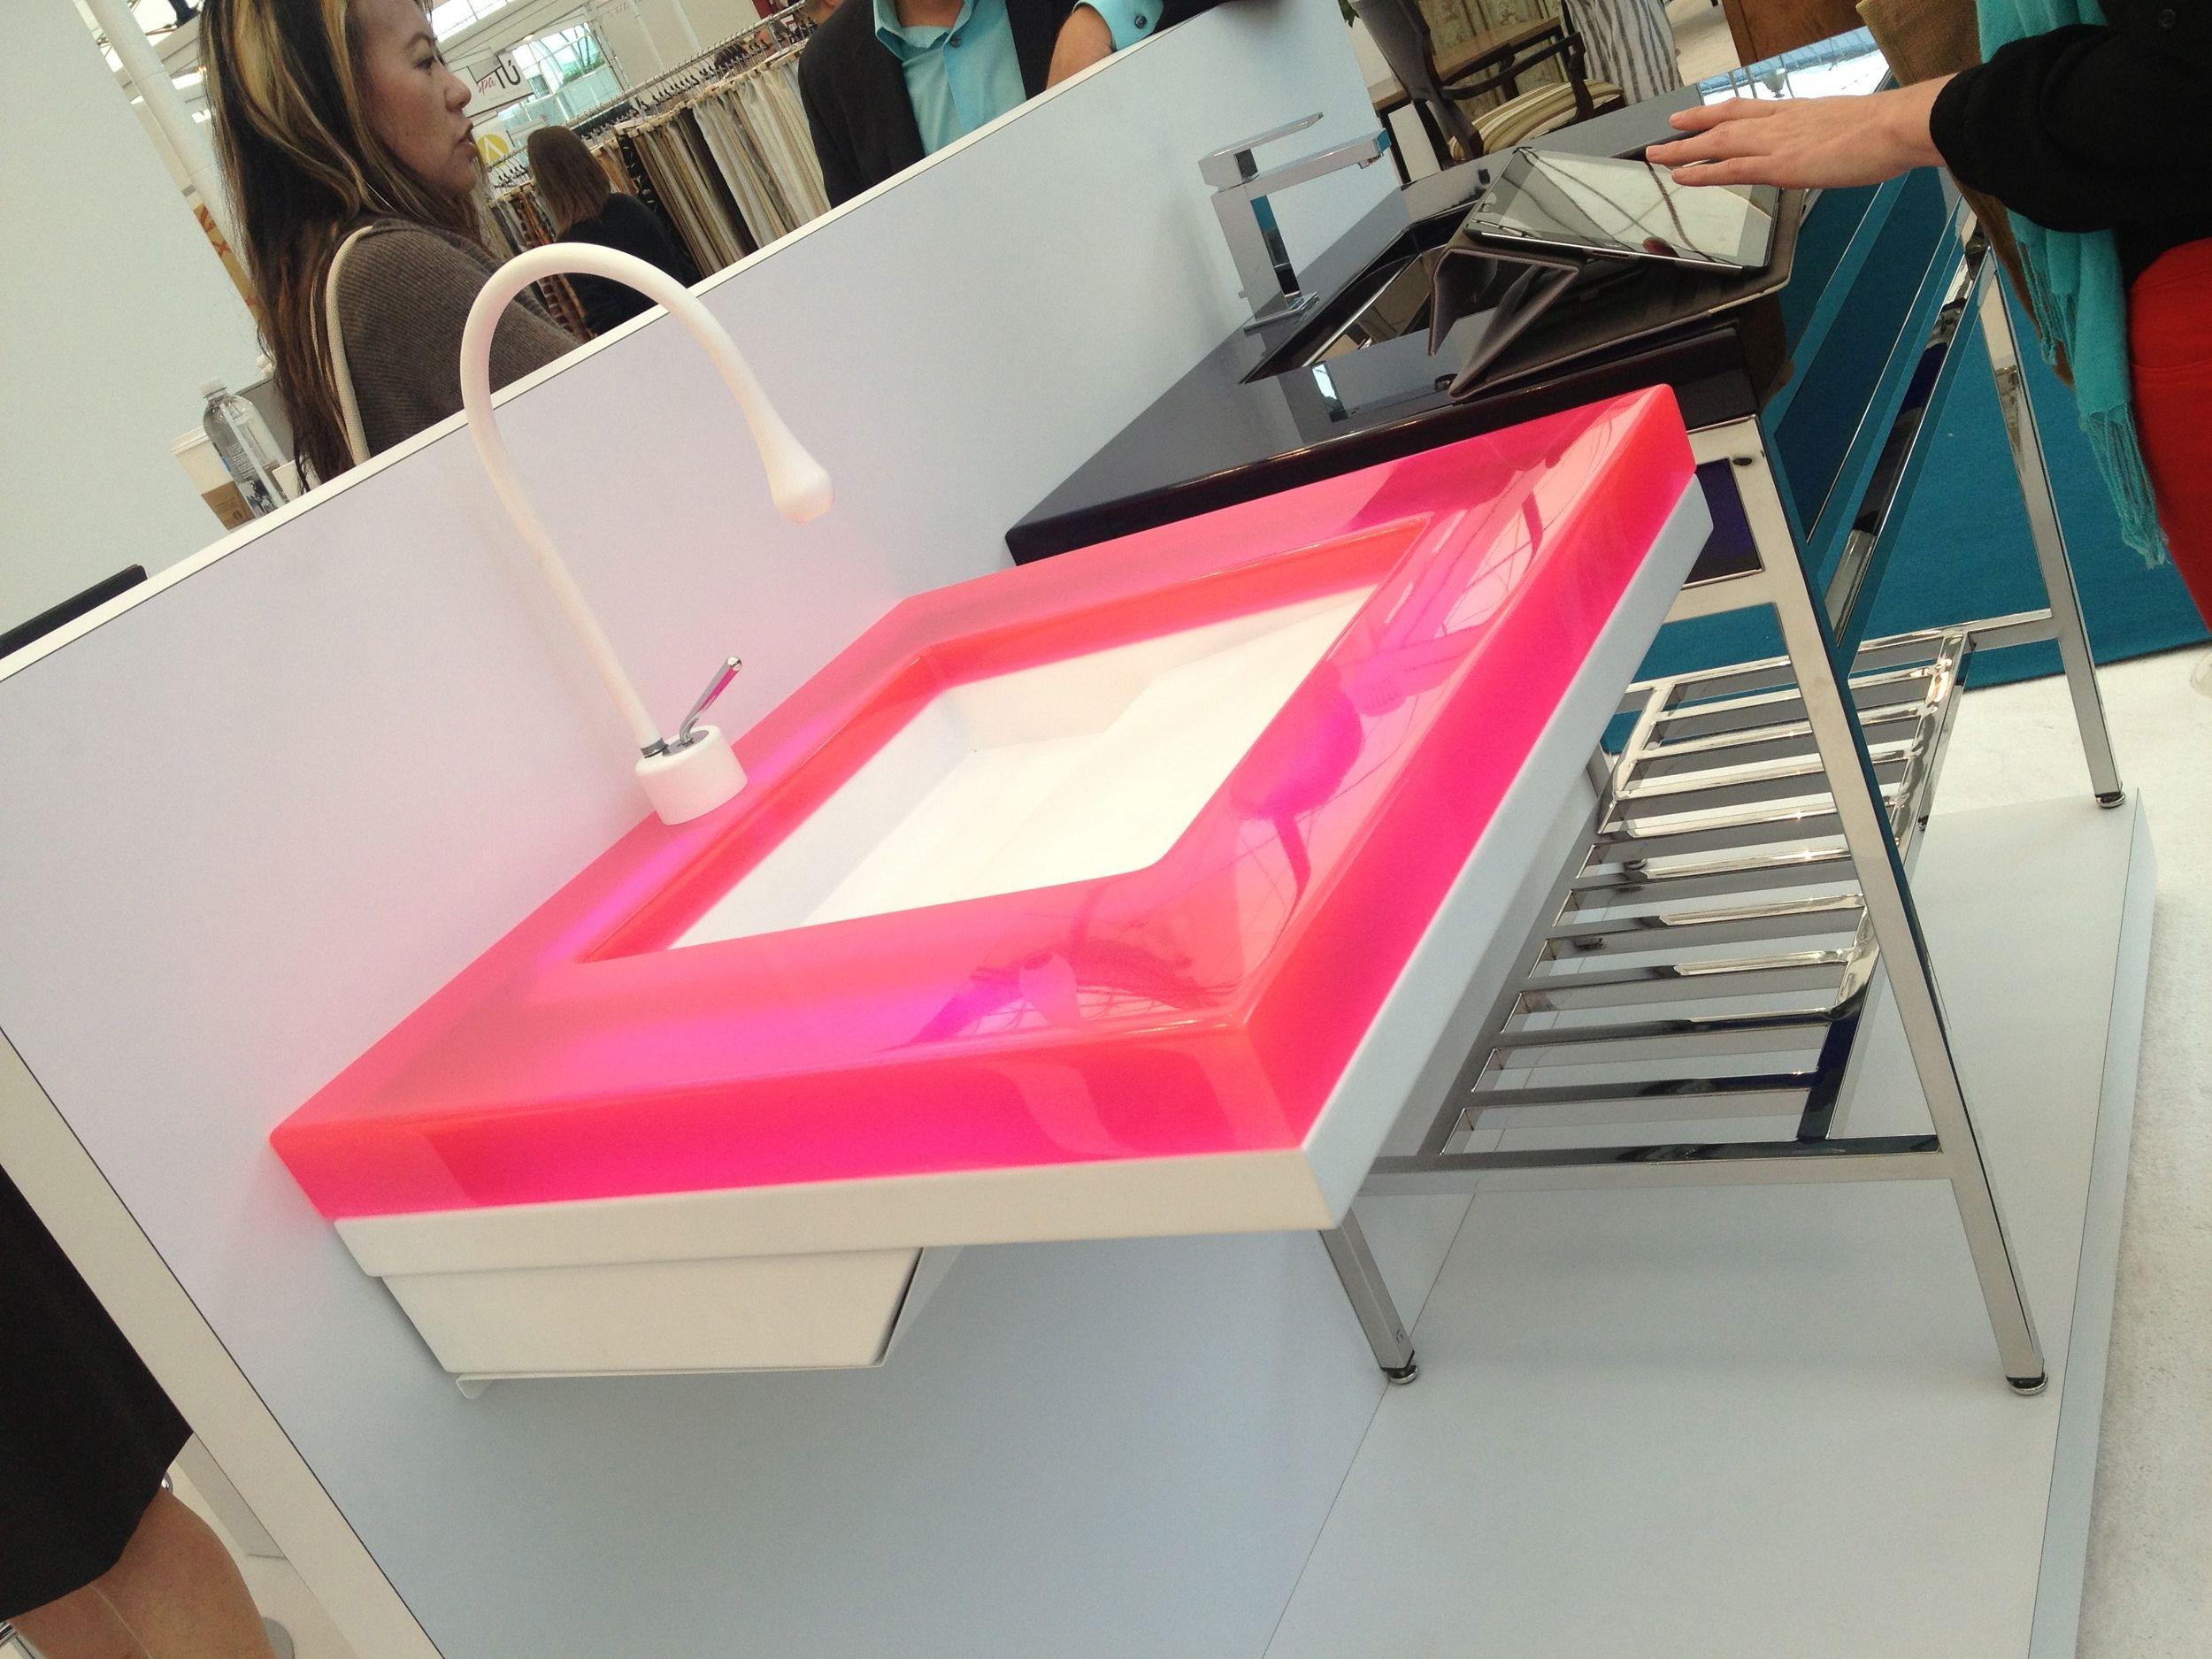 NeoMetro - resin sinks